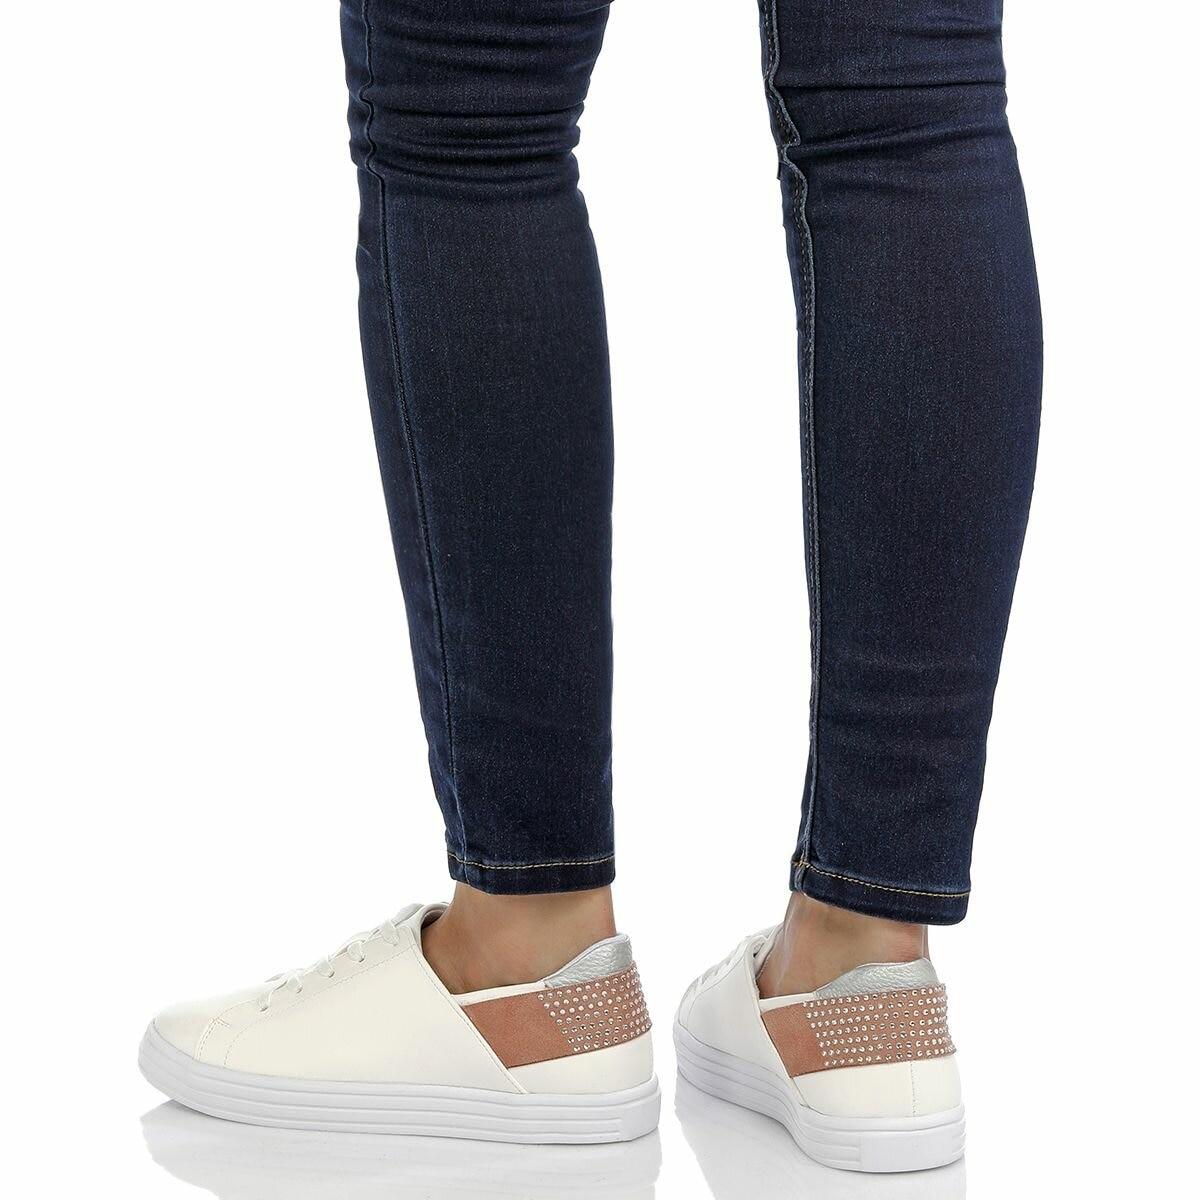 FLO CS18058 White Women 'S Sneaker Shoes BUTIGO